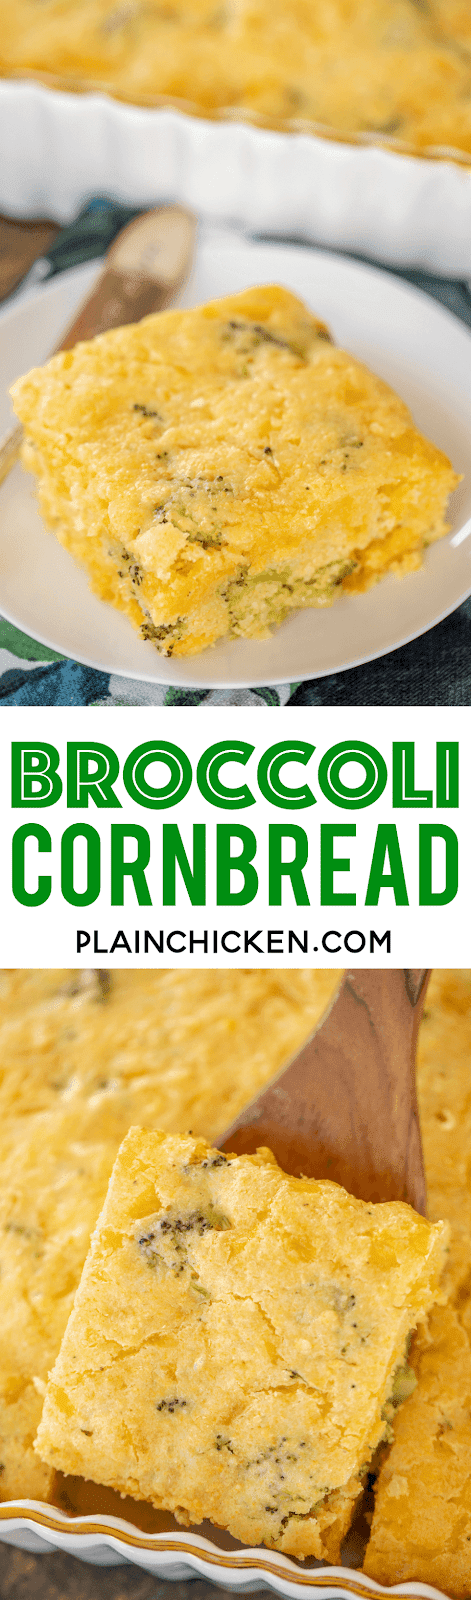 cornbread slice on a plate